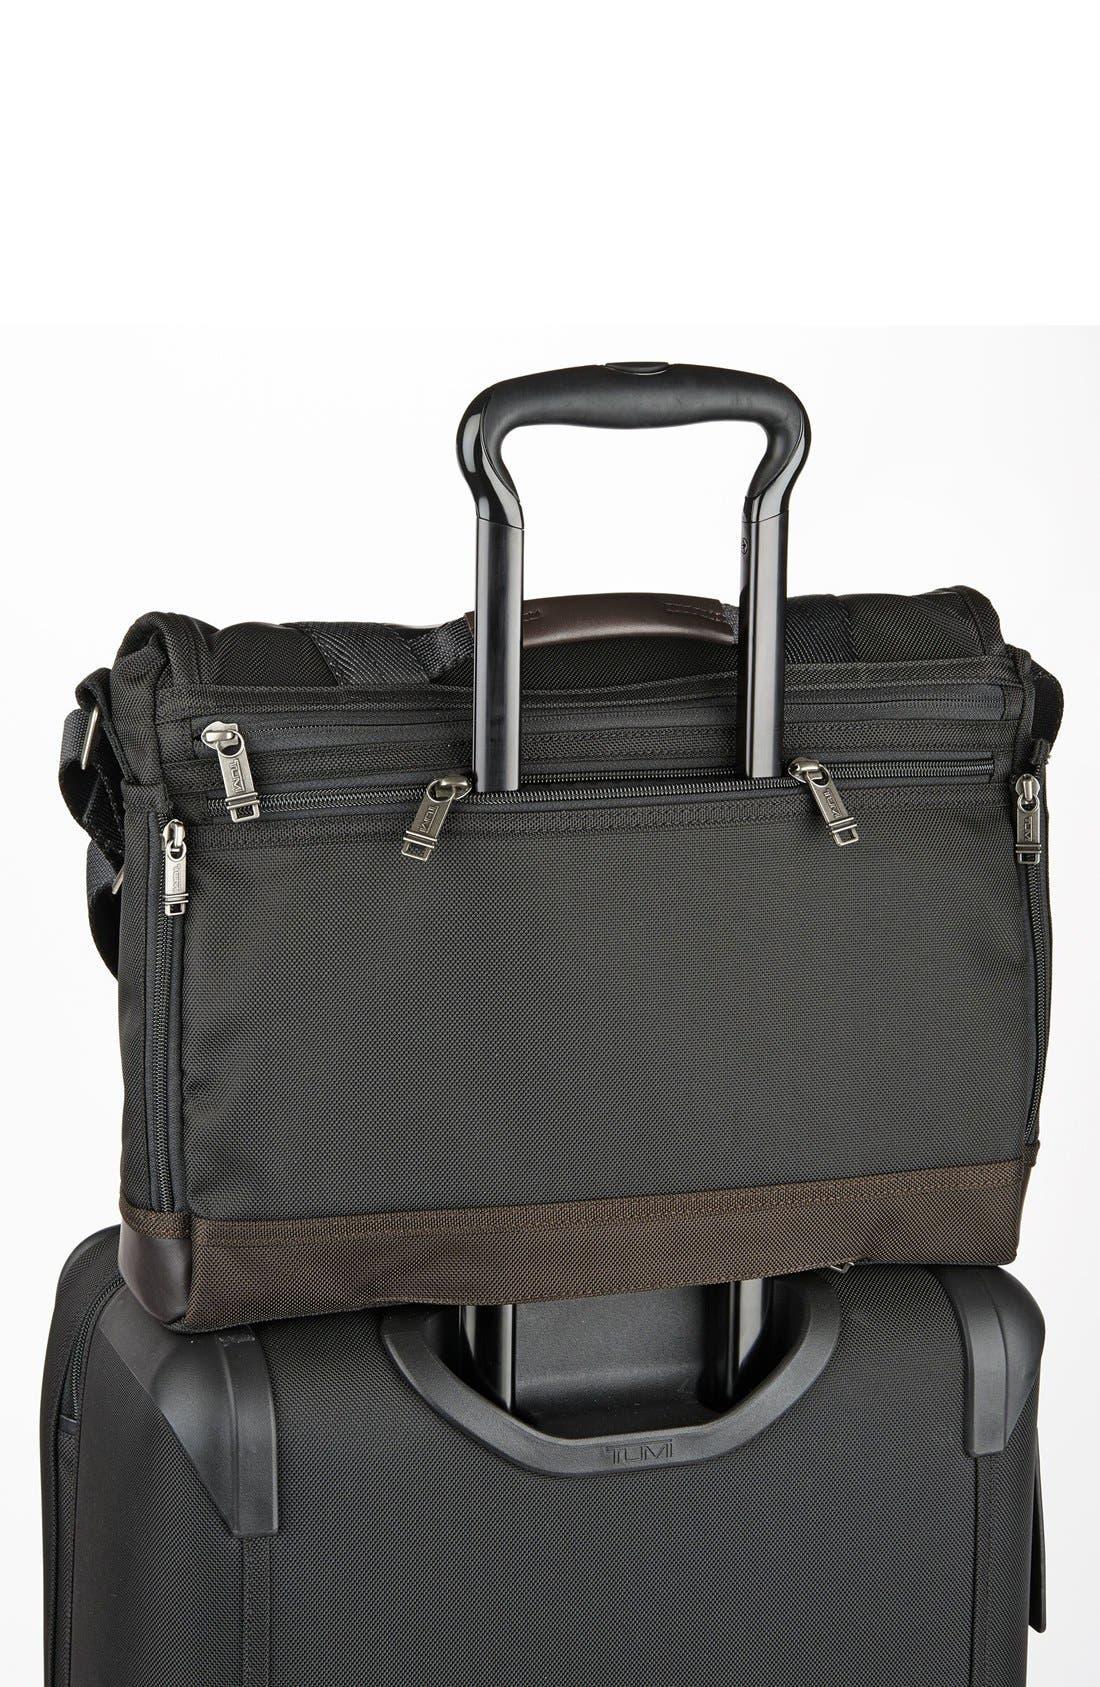 'Alpha Bravo - Foster' Messenger Bag,                             Alternate thumbnail 6, color,                             001